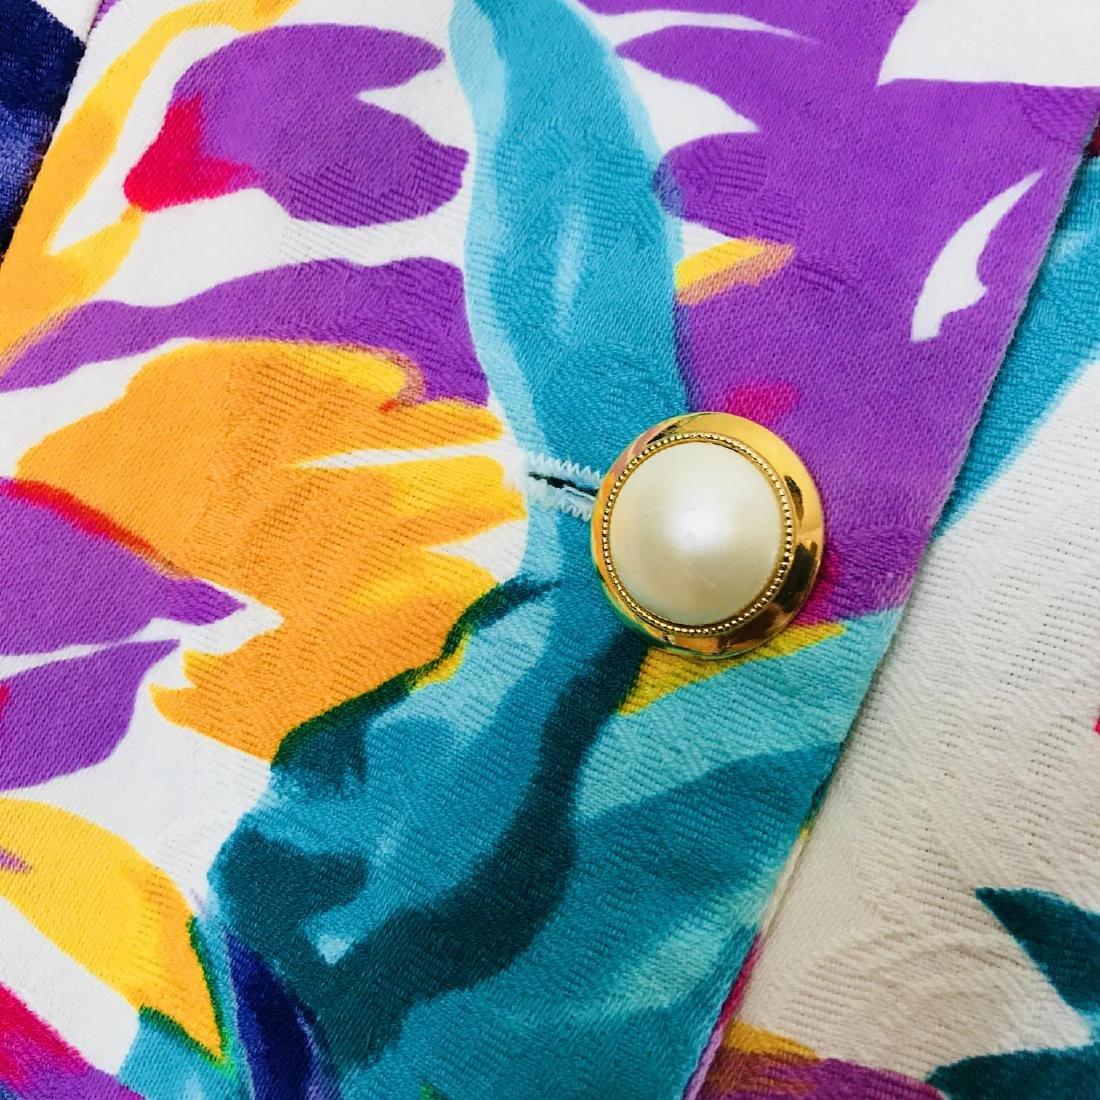 Vintage Women's Braemar Petites Summer Blouse Top Size - 8